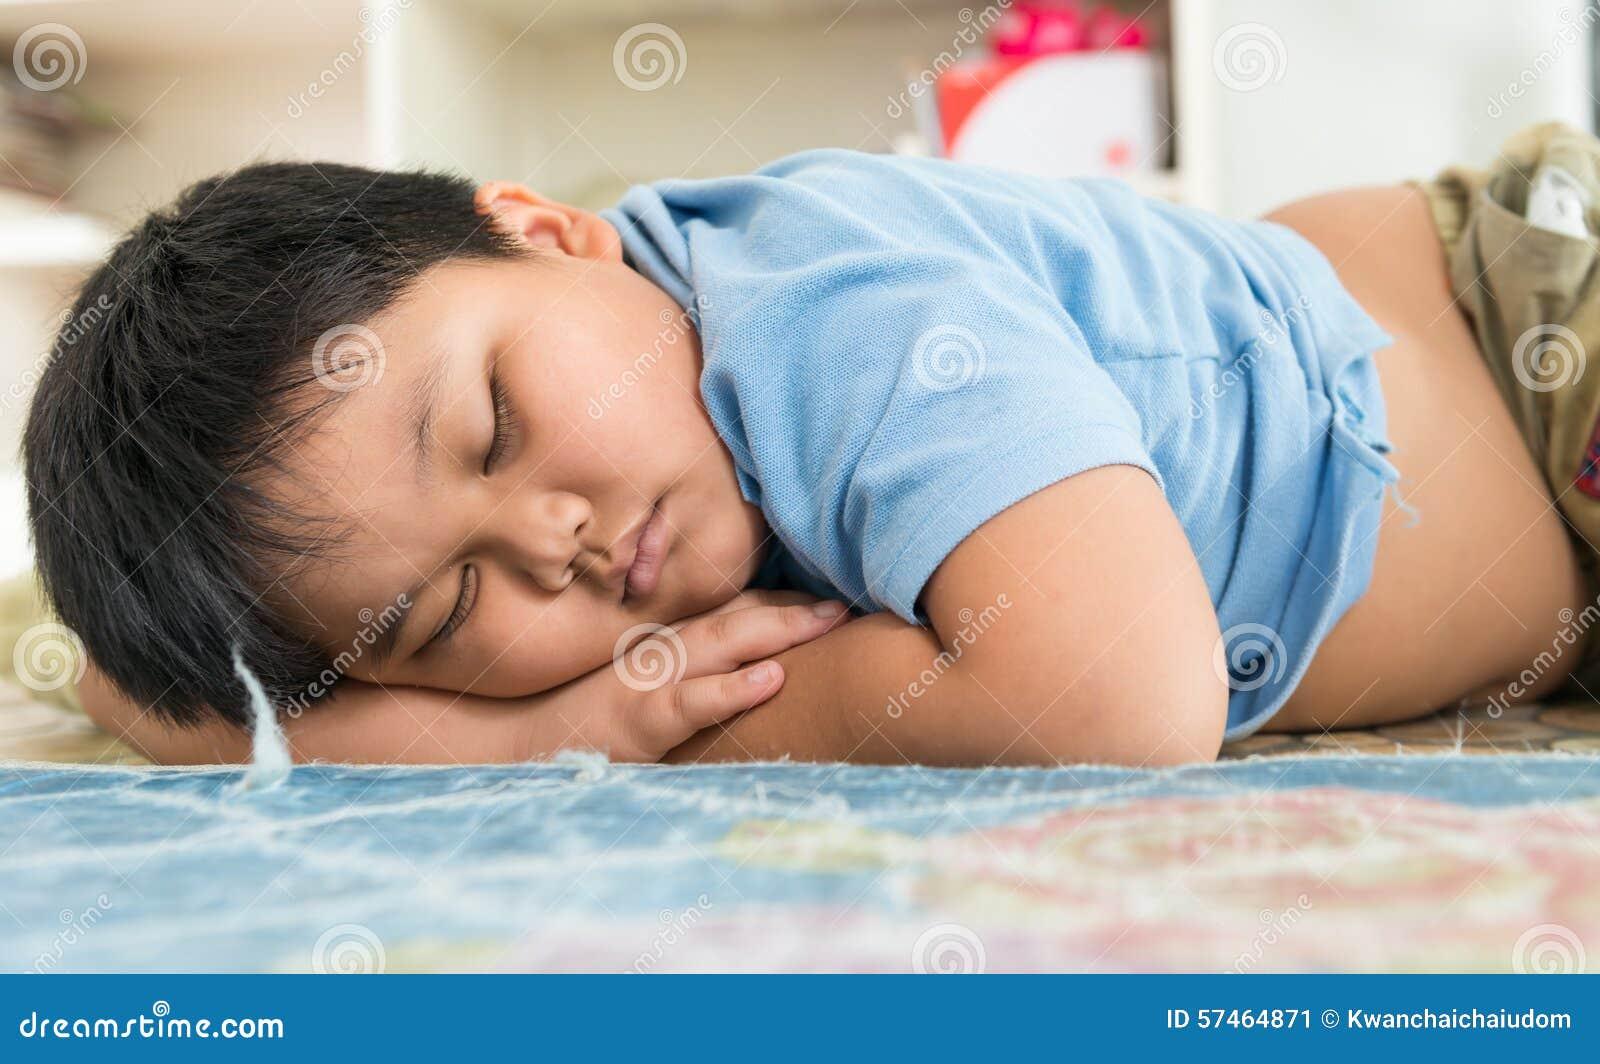 Fat boy sleep dream on his arm